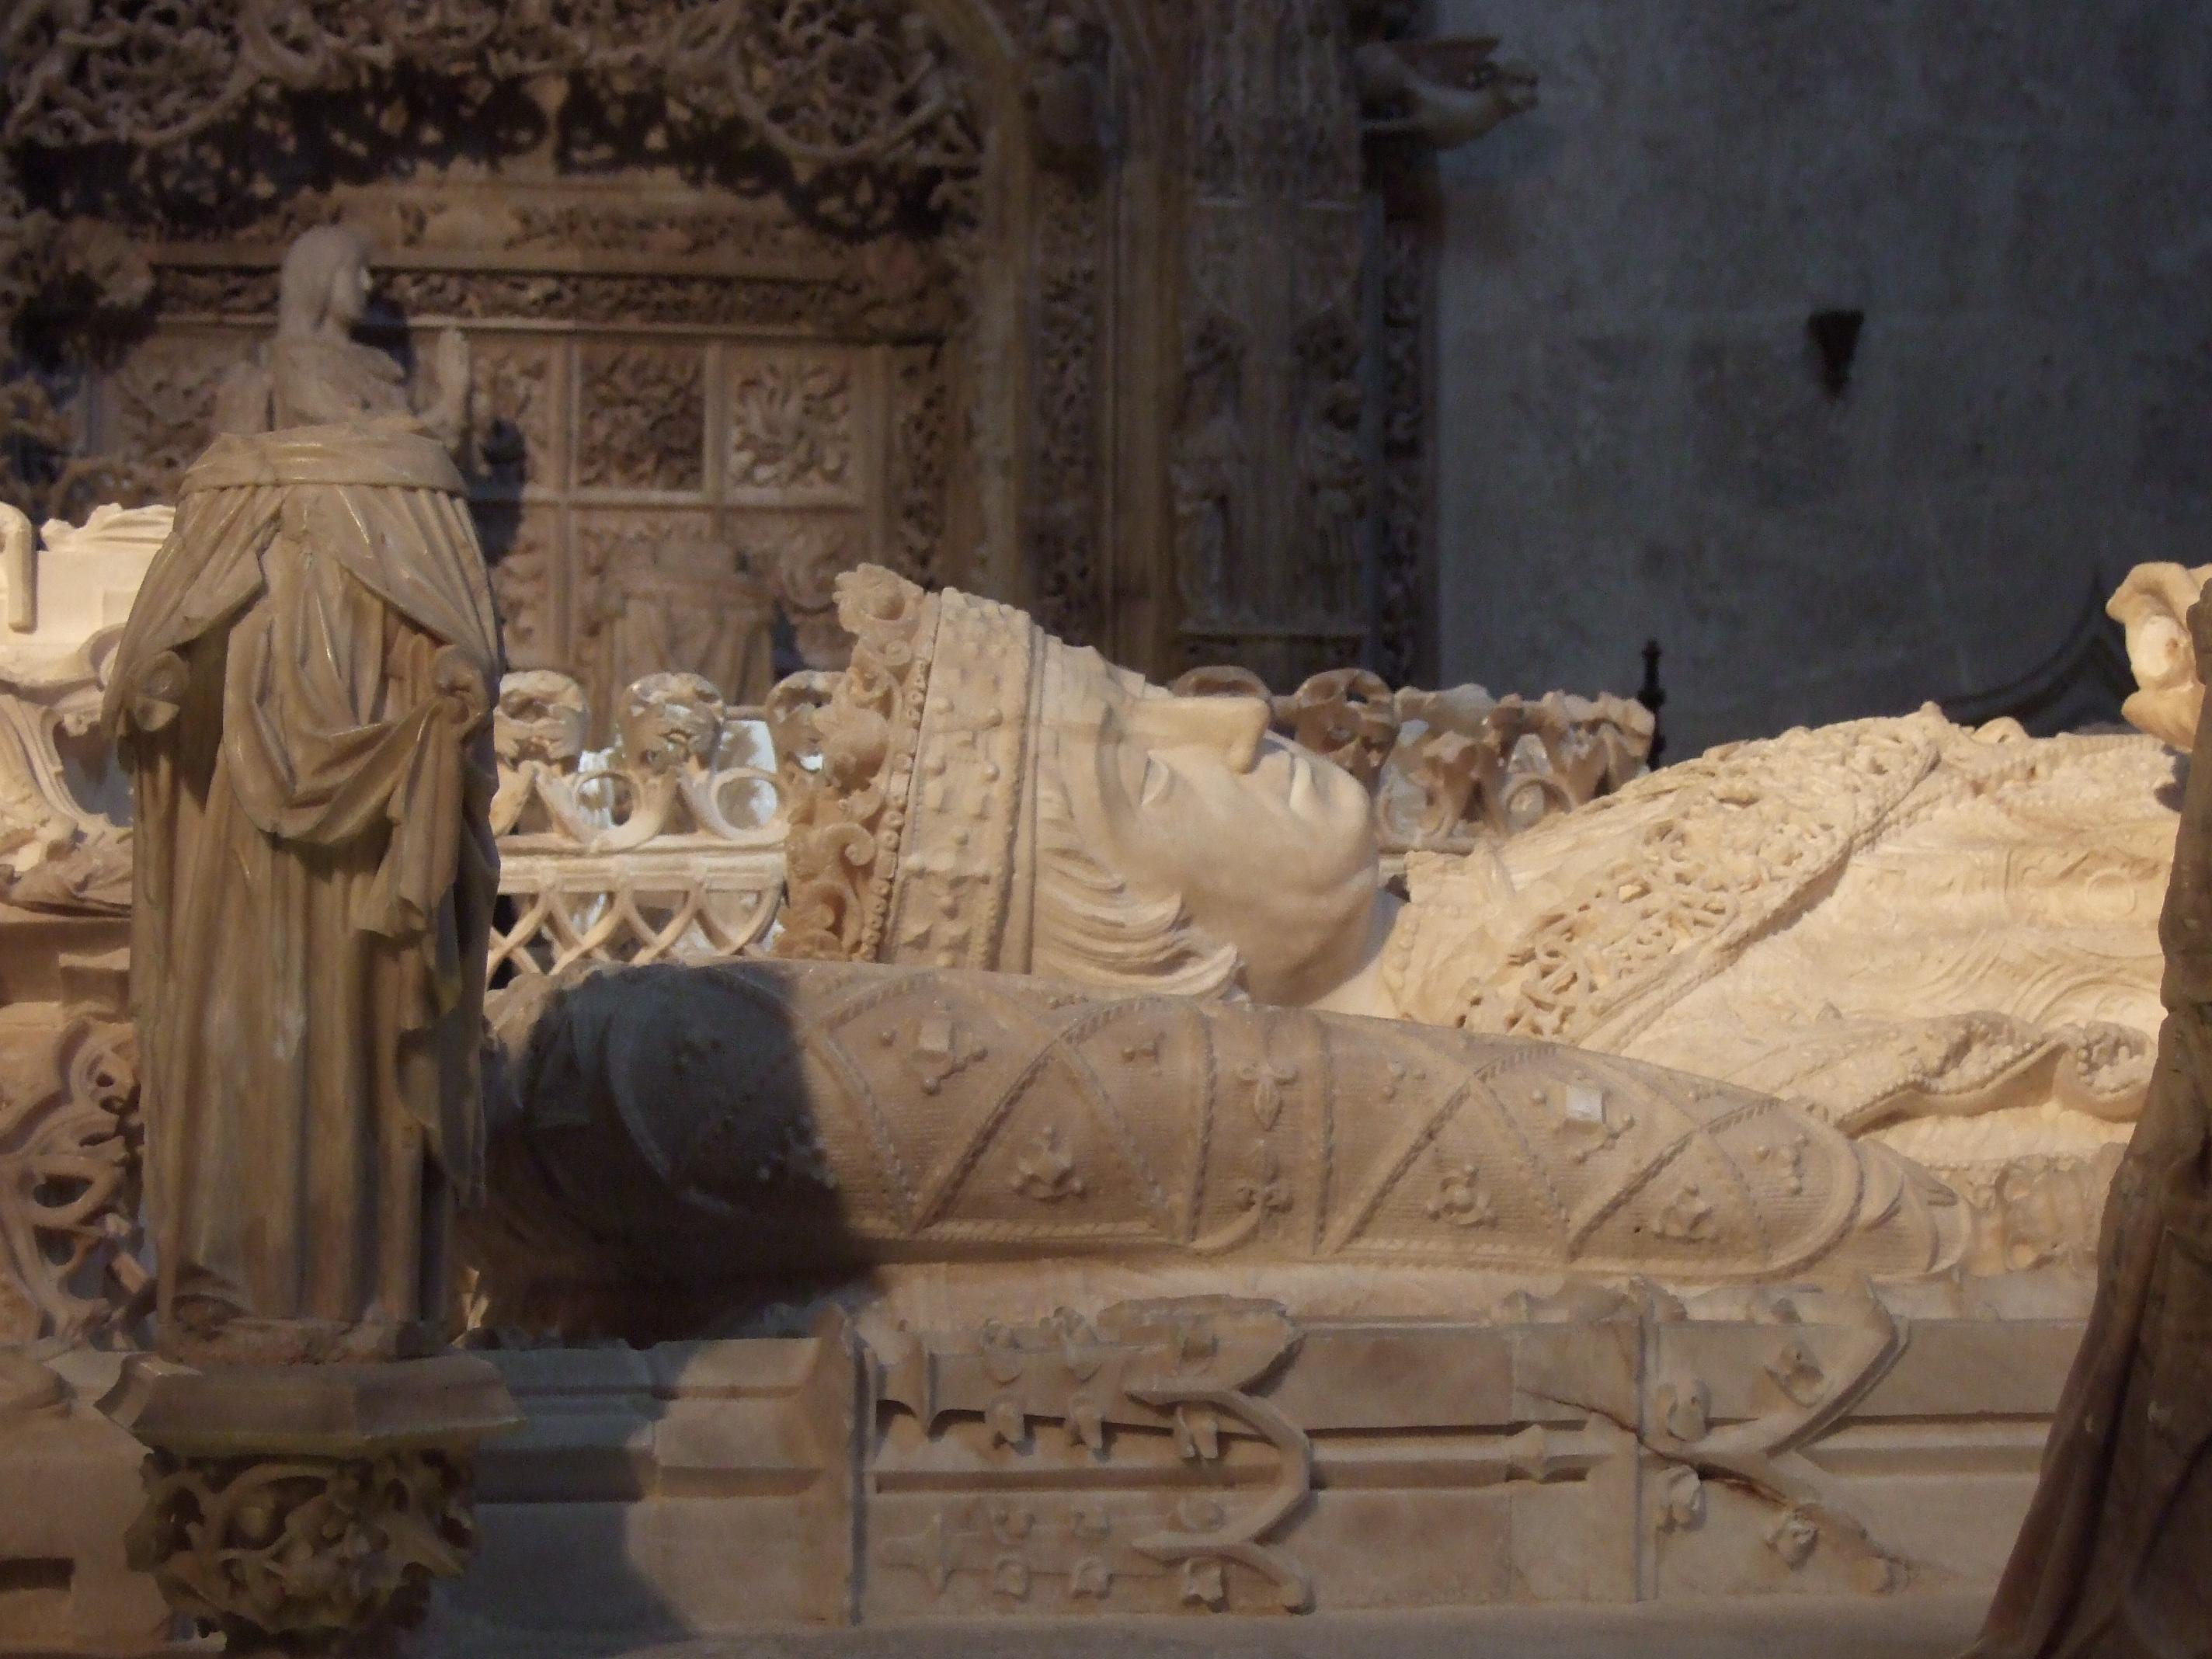 Depiction of Juan II de Castilla